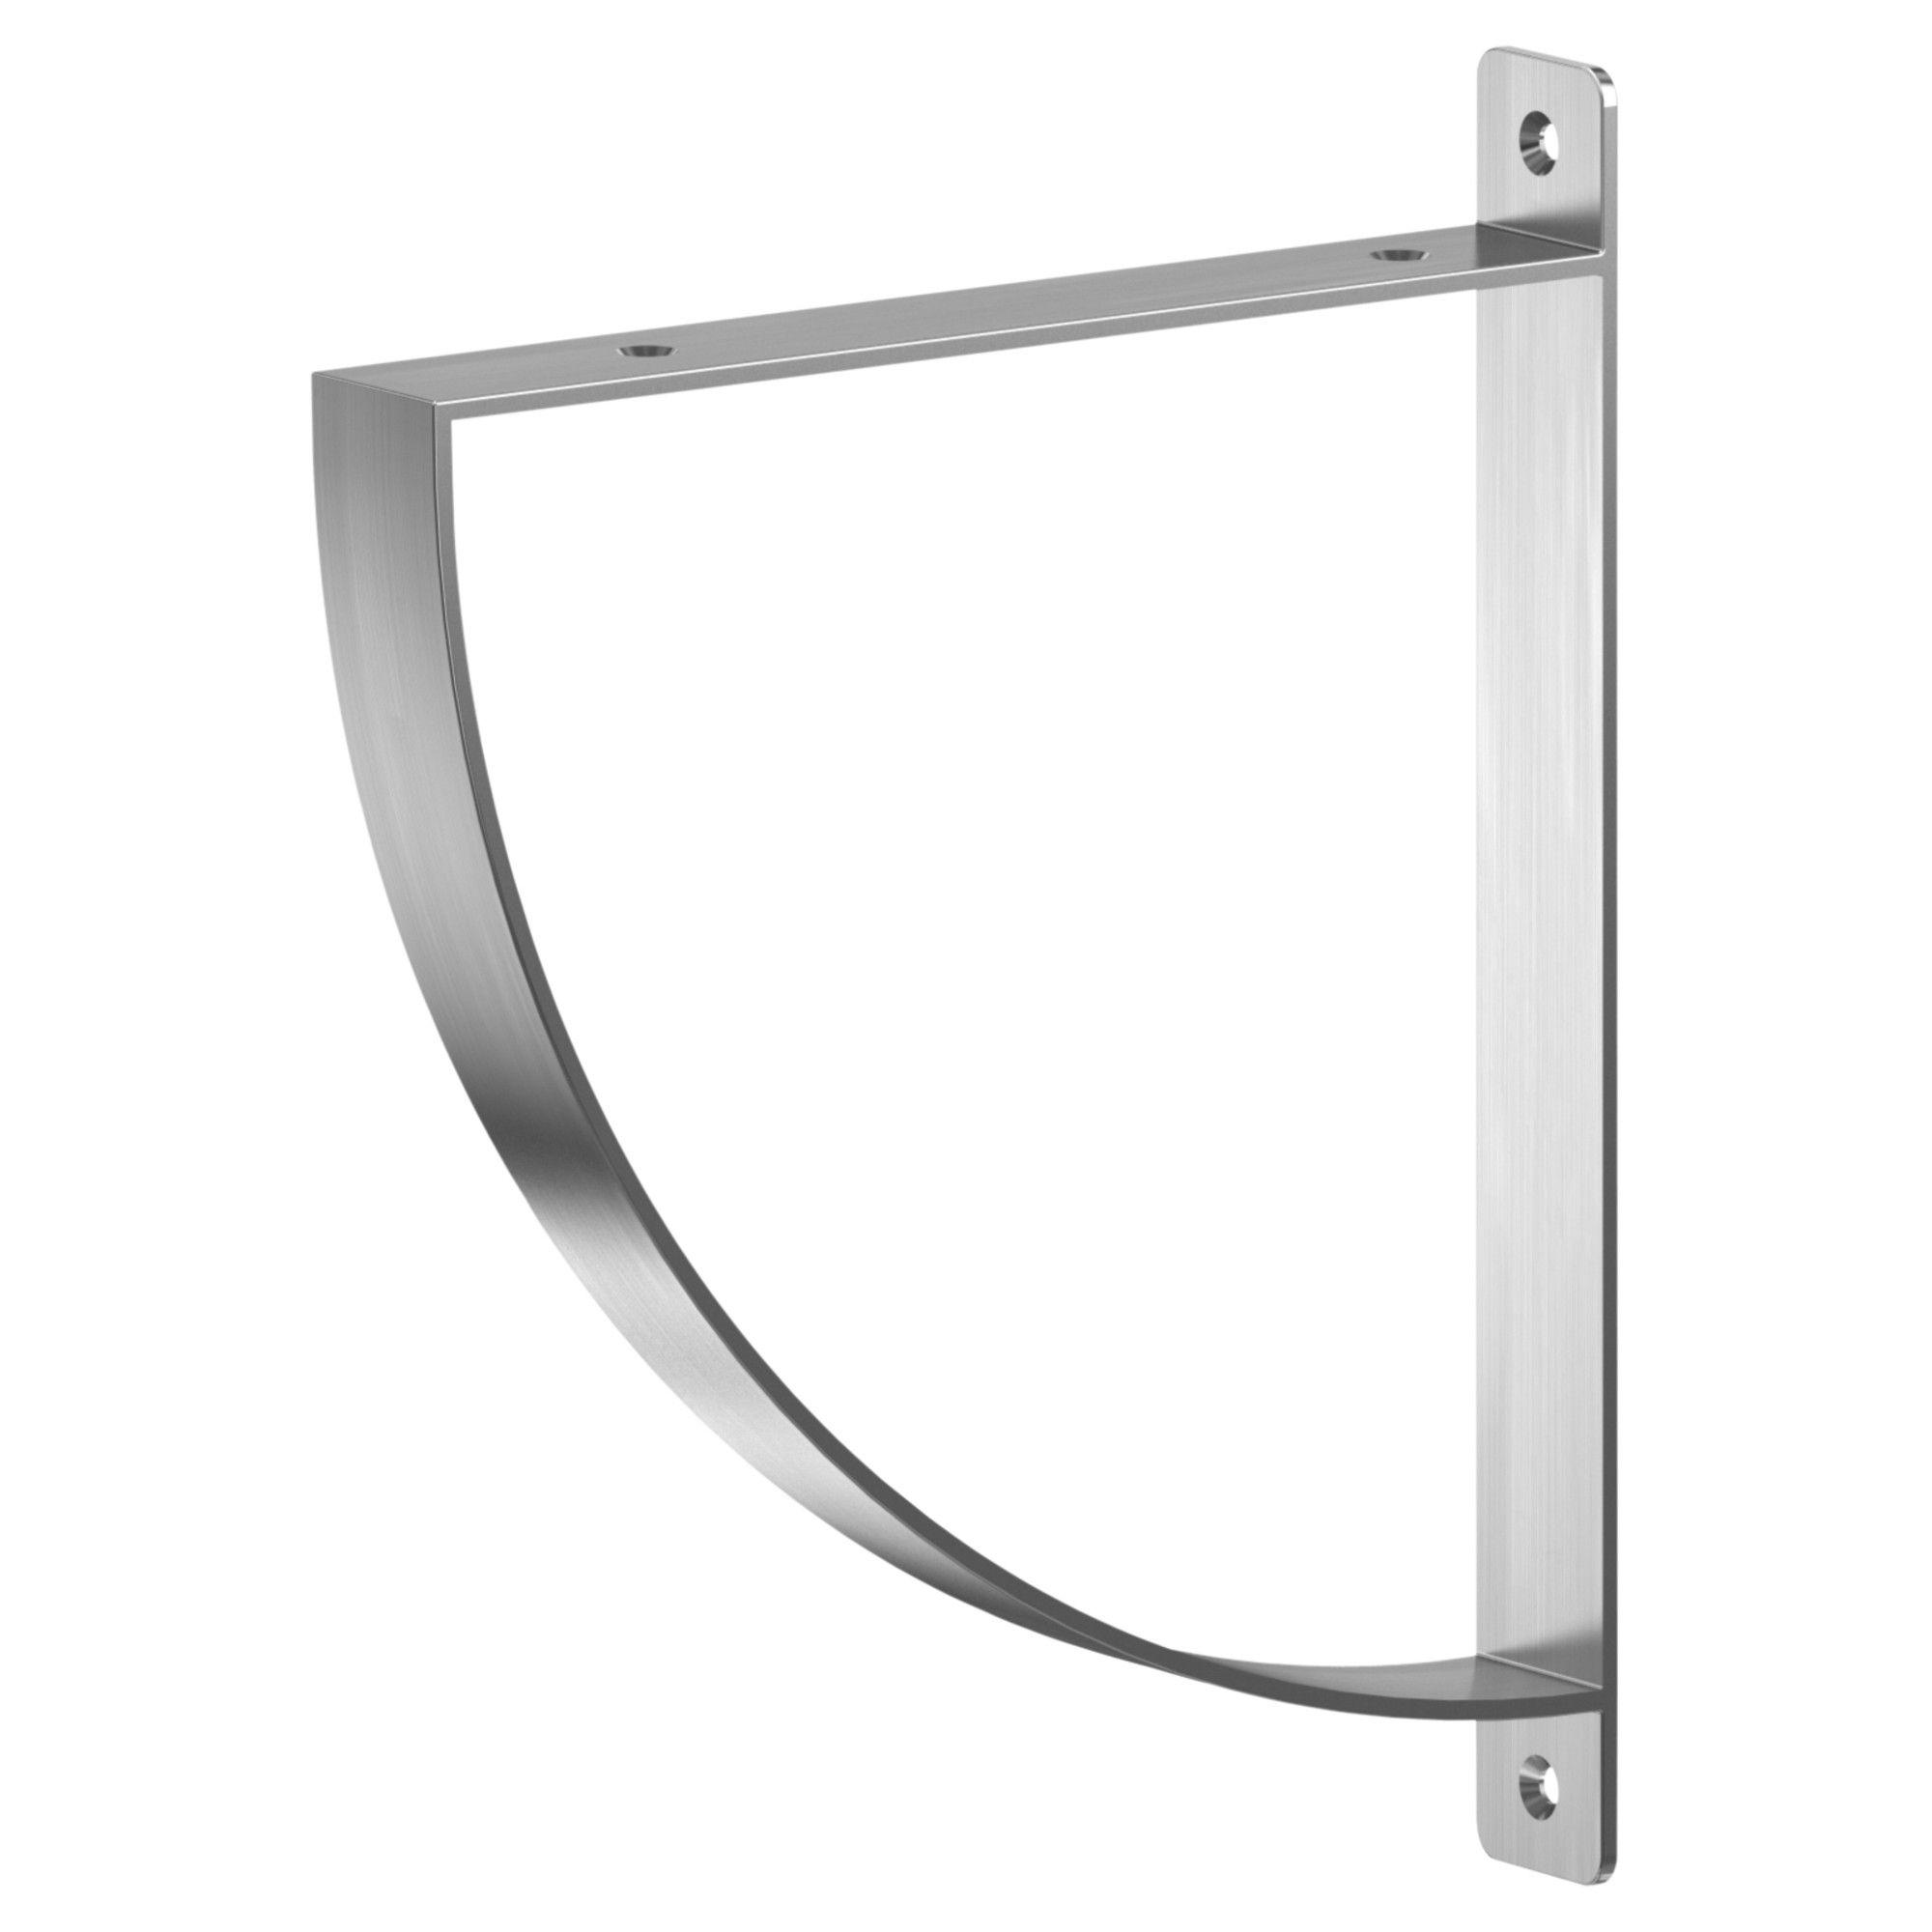 Muebles Colchones Y Decoracion Compra Online Decorative Metal Shelf Brackets Ikea Wall Shelves Wooden Shelf Brackets